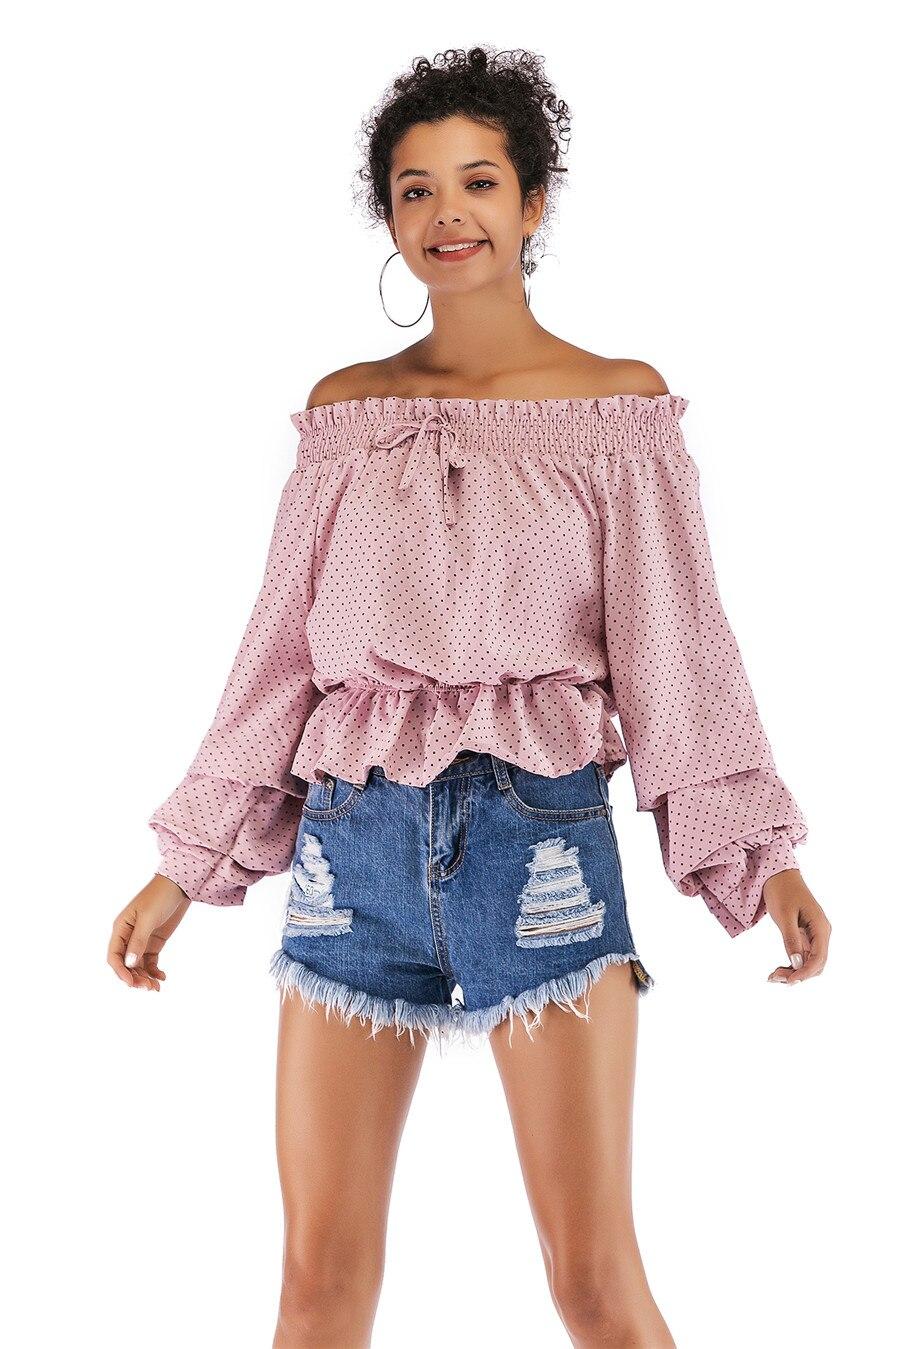 Gladiolus Chiffon Blouse Women 2019 Spring Autumn Long Sleeve Polka Dot Off Shoulder Sexy Blouses Women Shirts Ruffles Blusas (27)